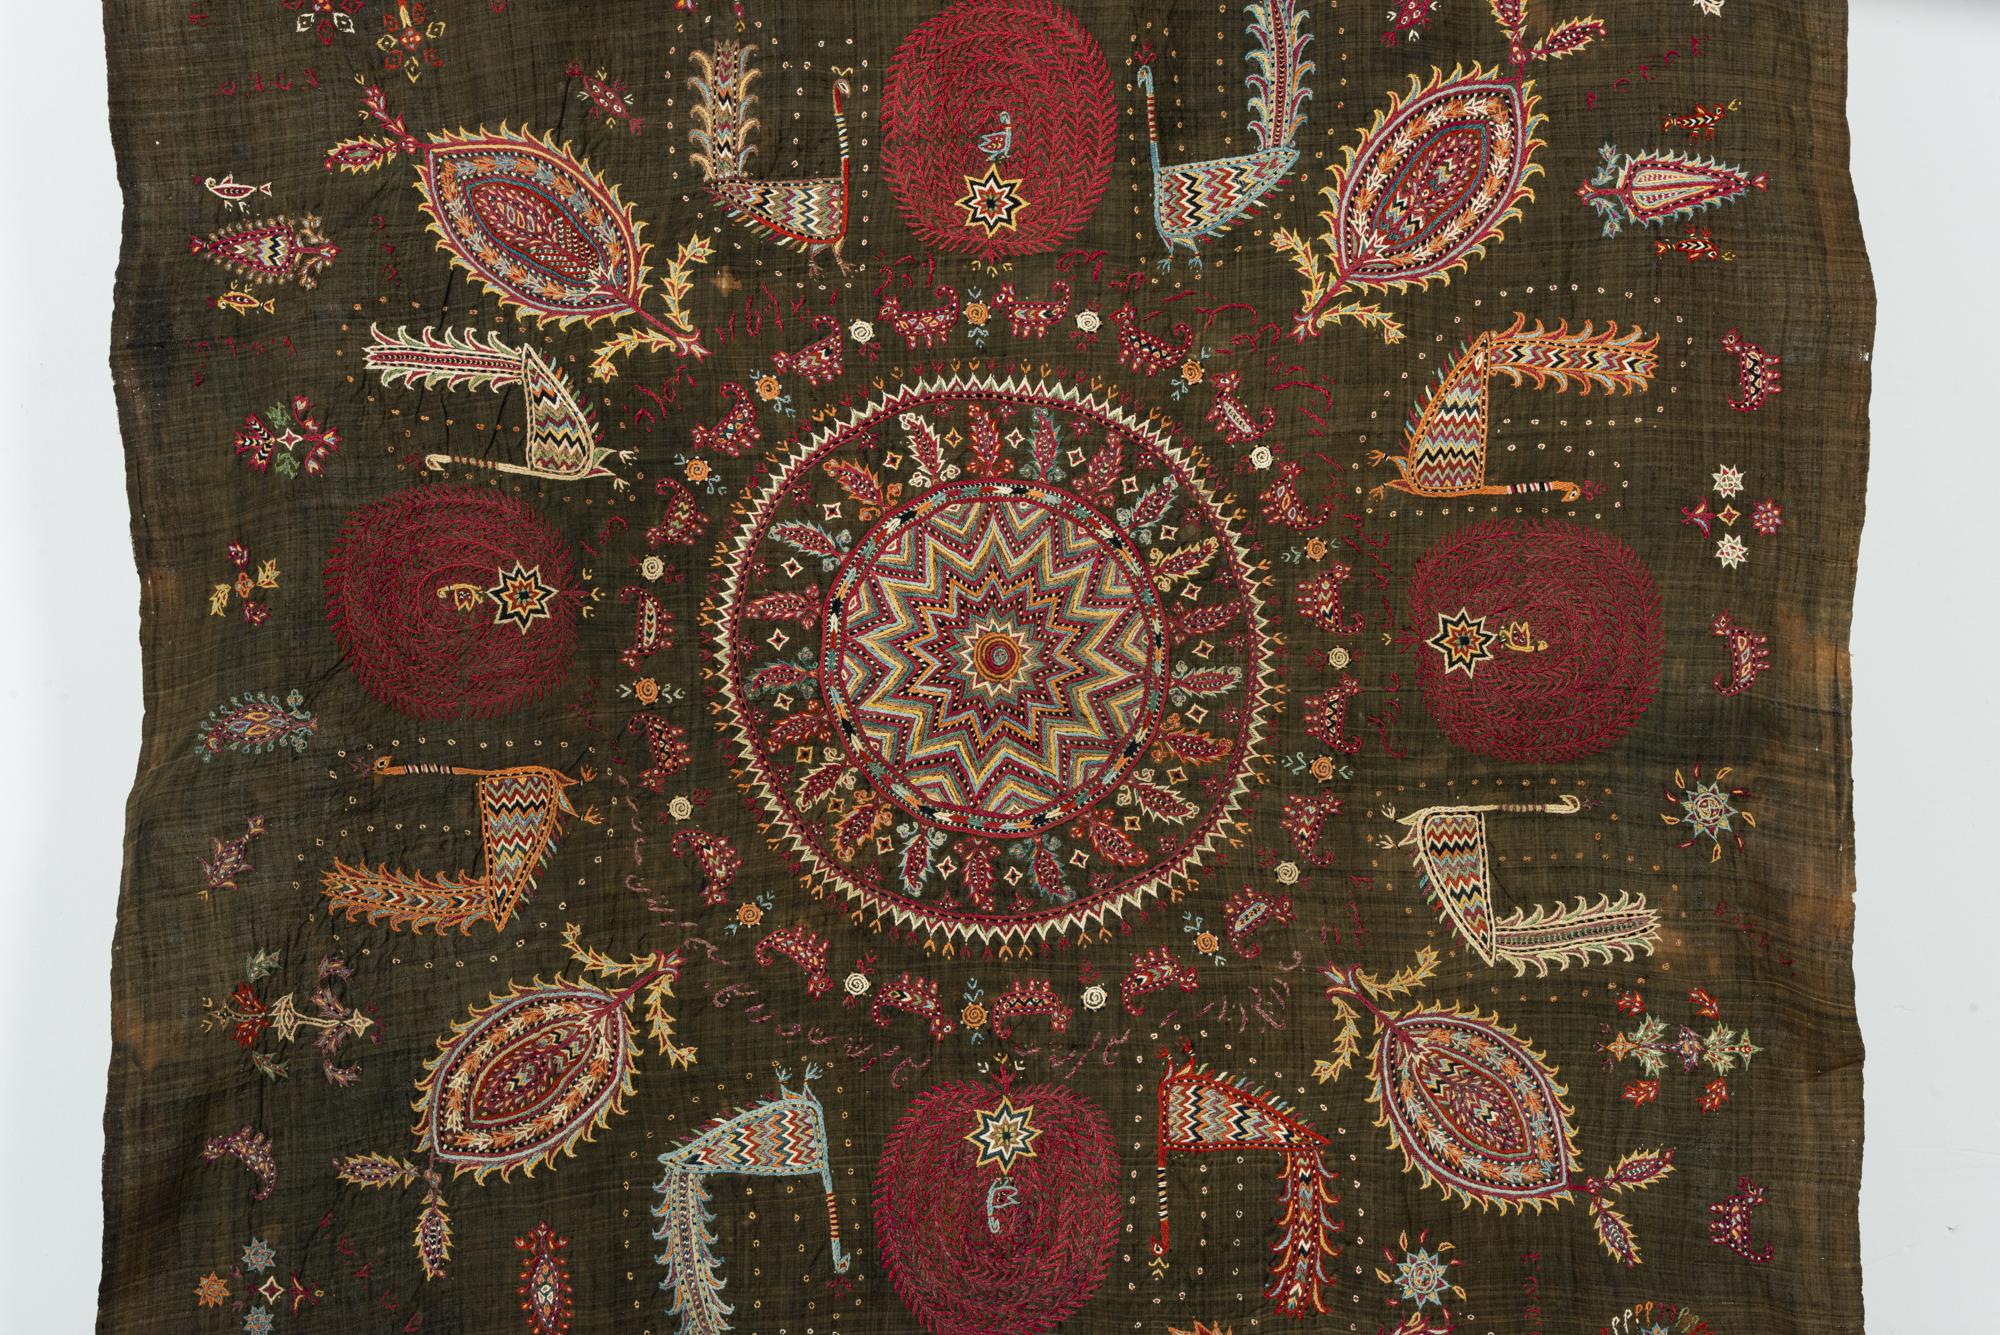 Detail of an embroidered silk wedding veil